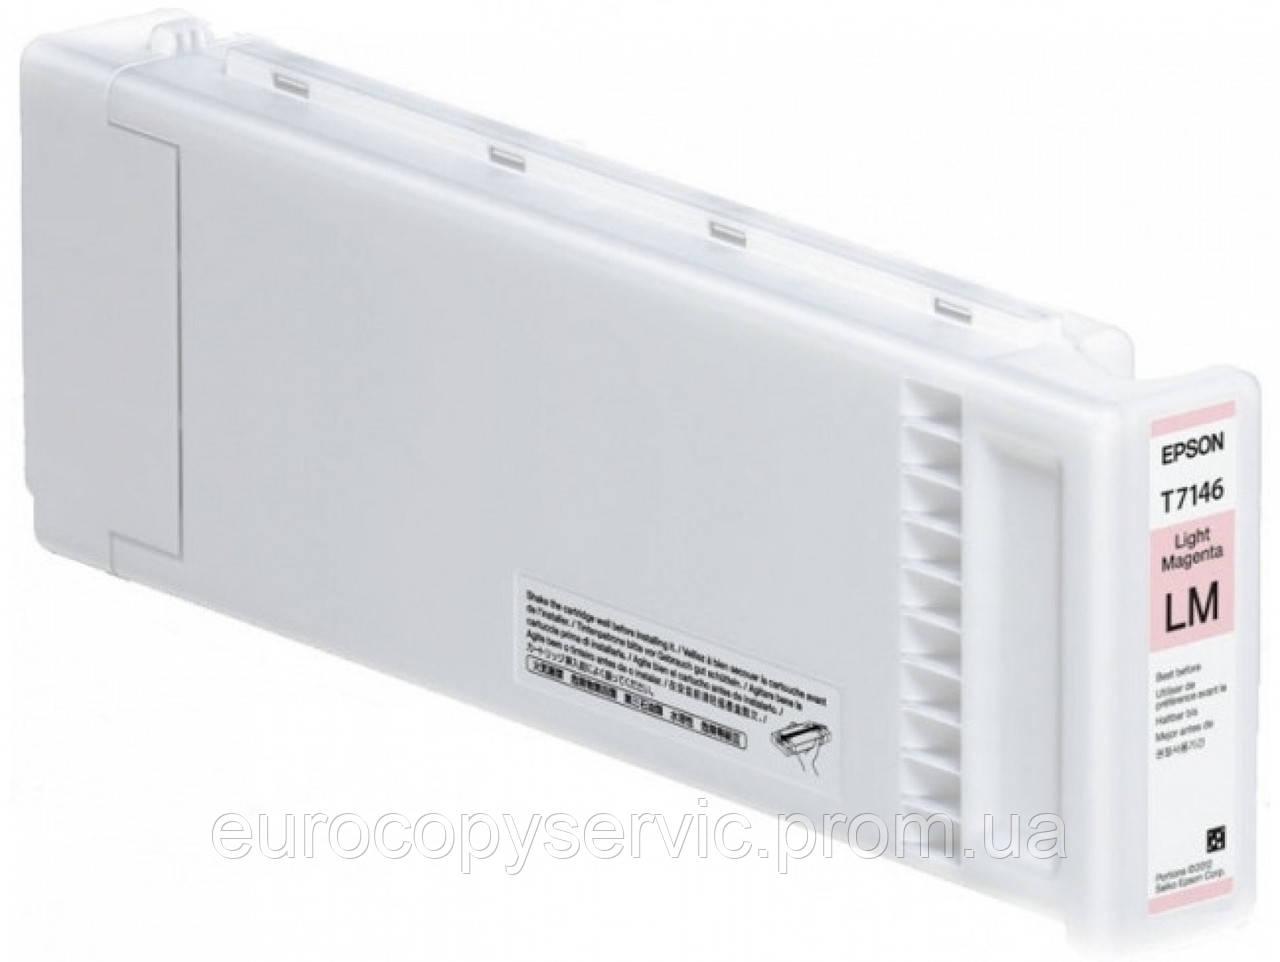 Картридж Epson для друку GS5/7 Light Magenta (700ml) (C13T714600)